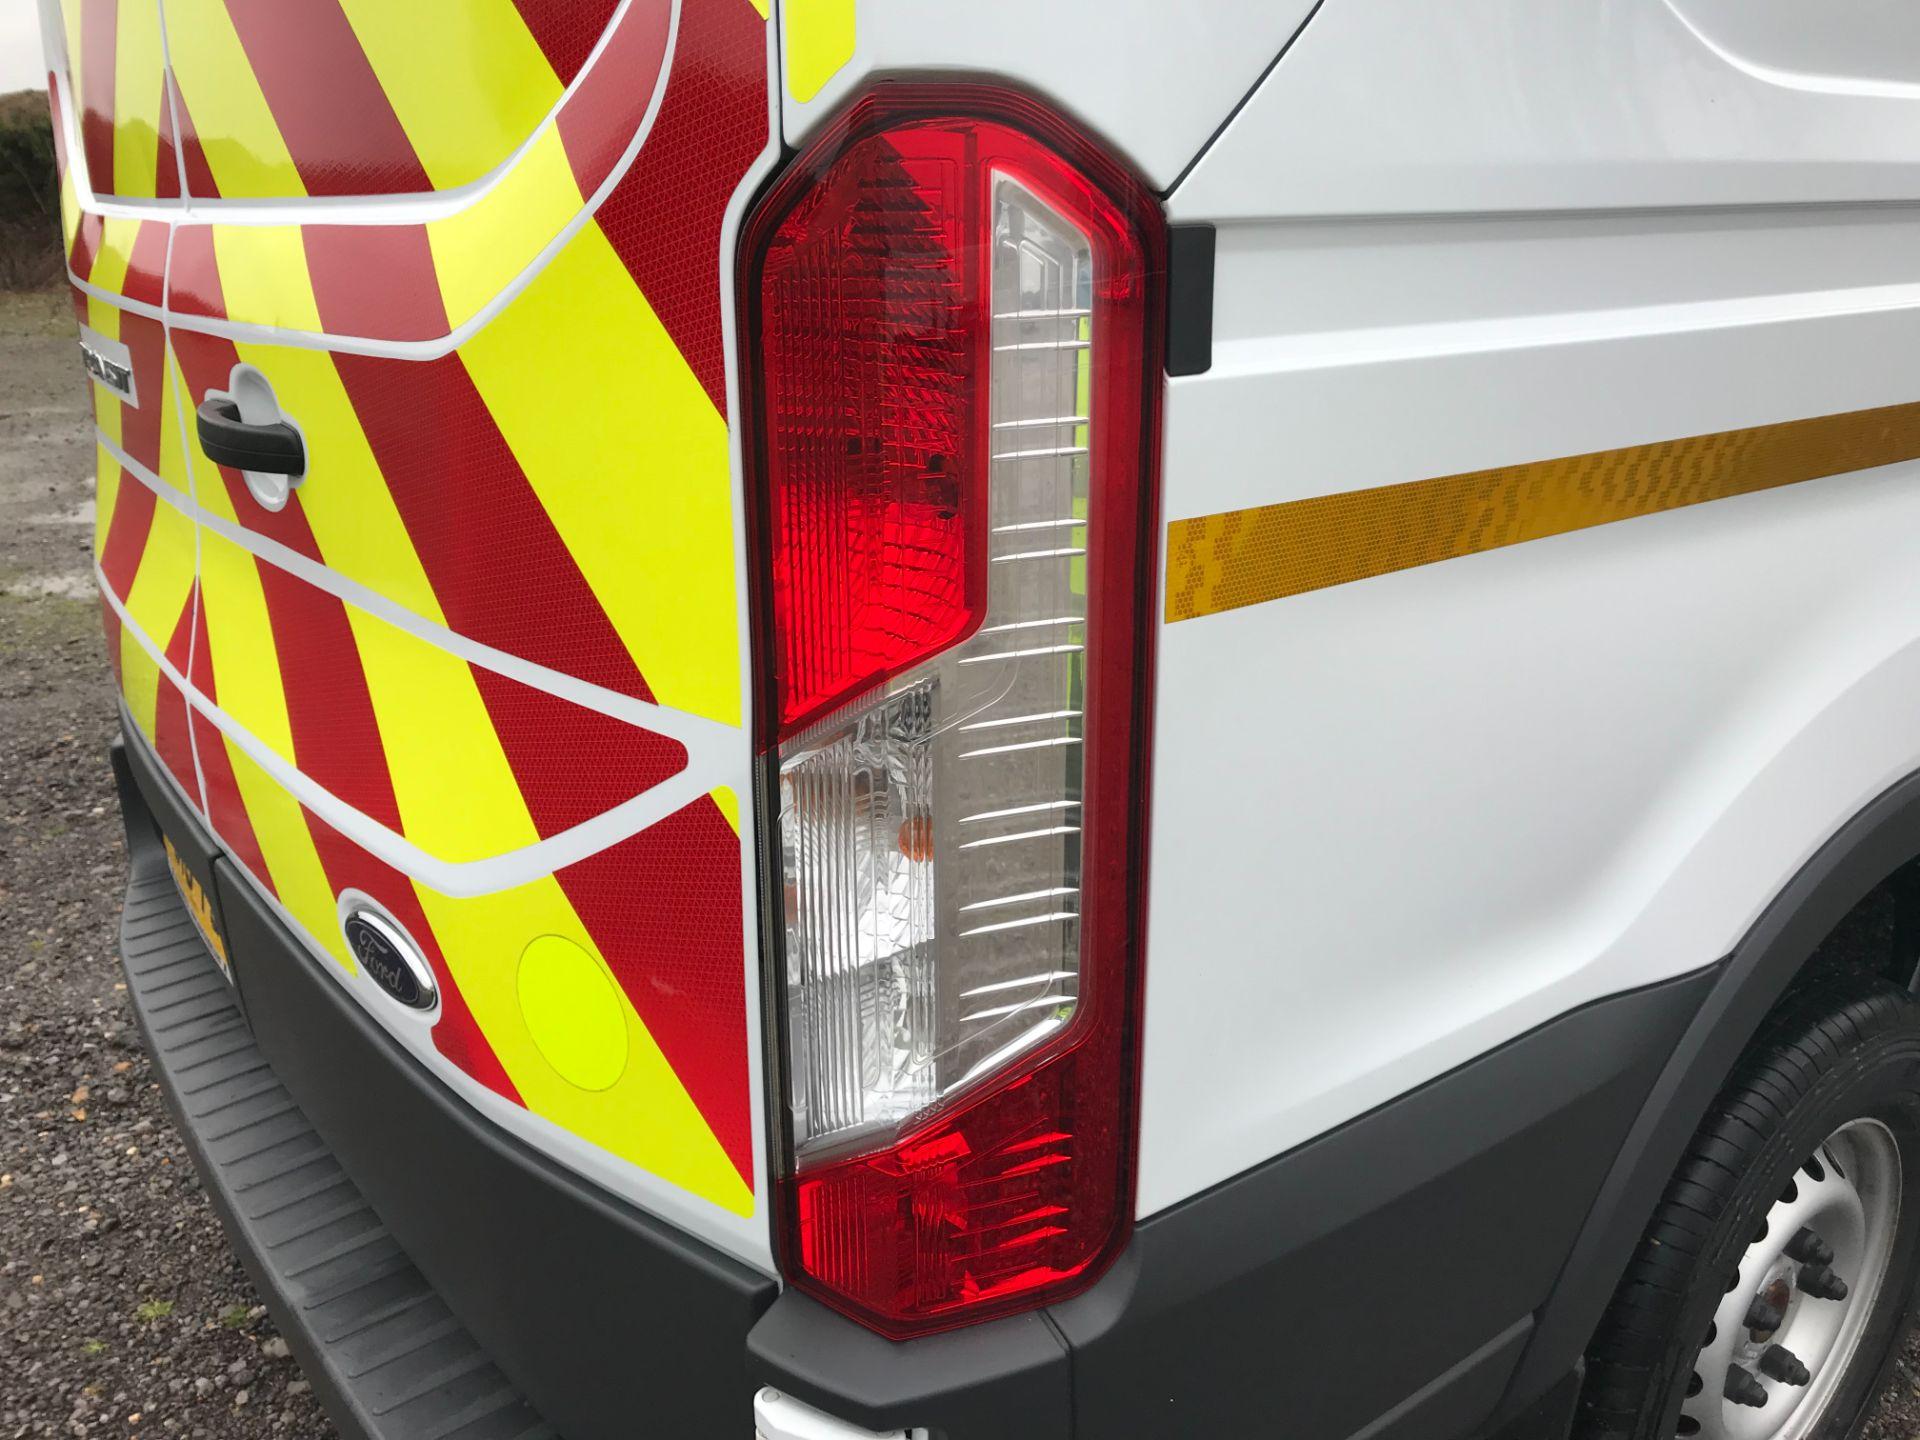 2018 Ford Transit 2.0 Tdci 130 L2 H2 EURO 6 (FG18YJM) Image 47